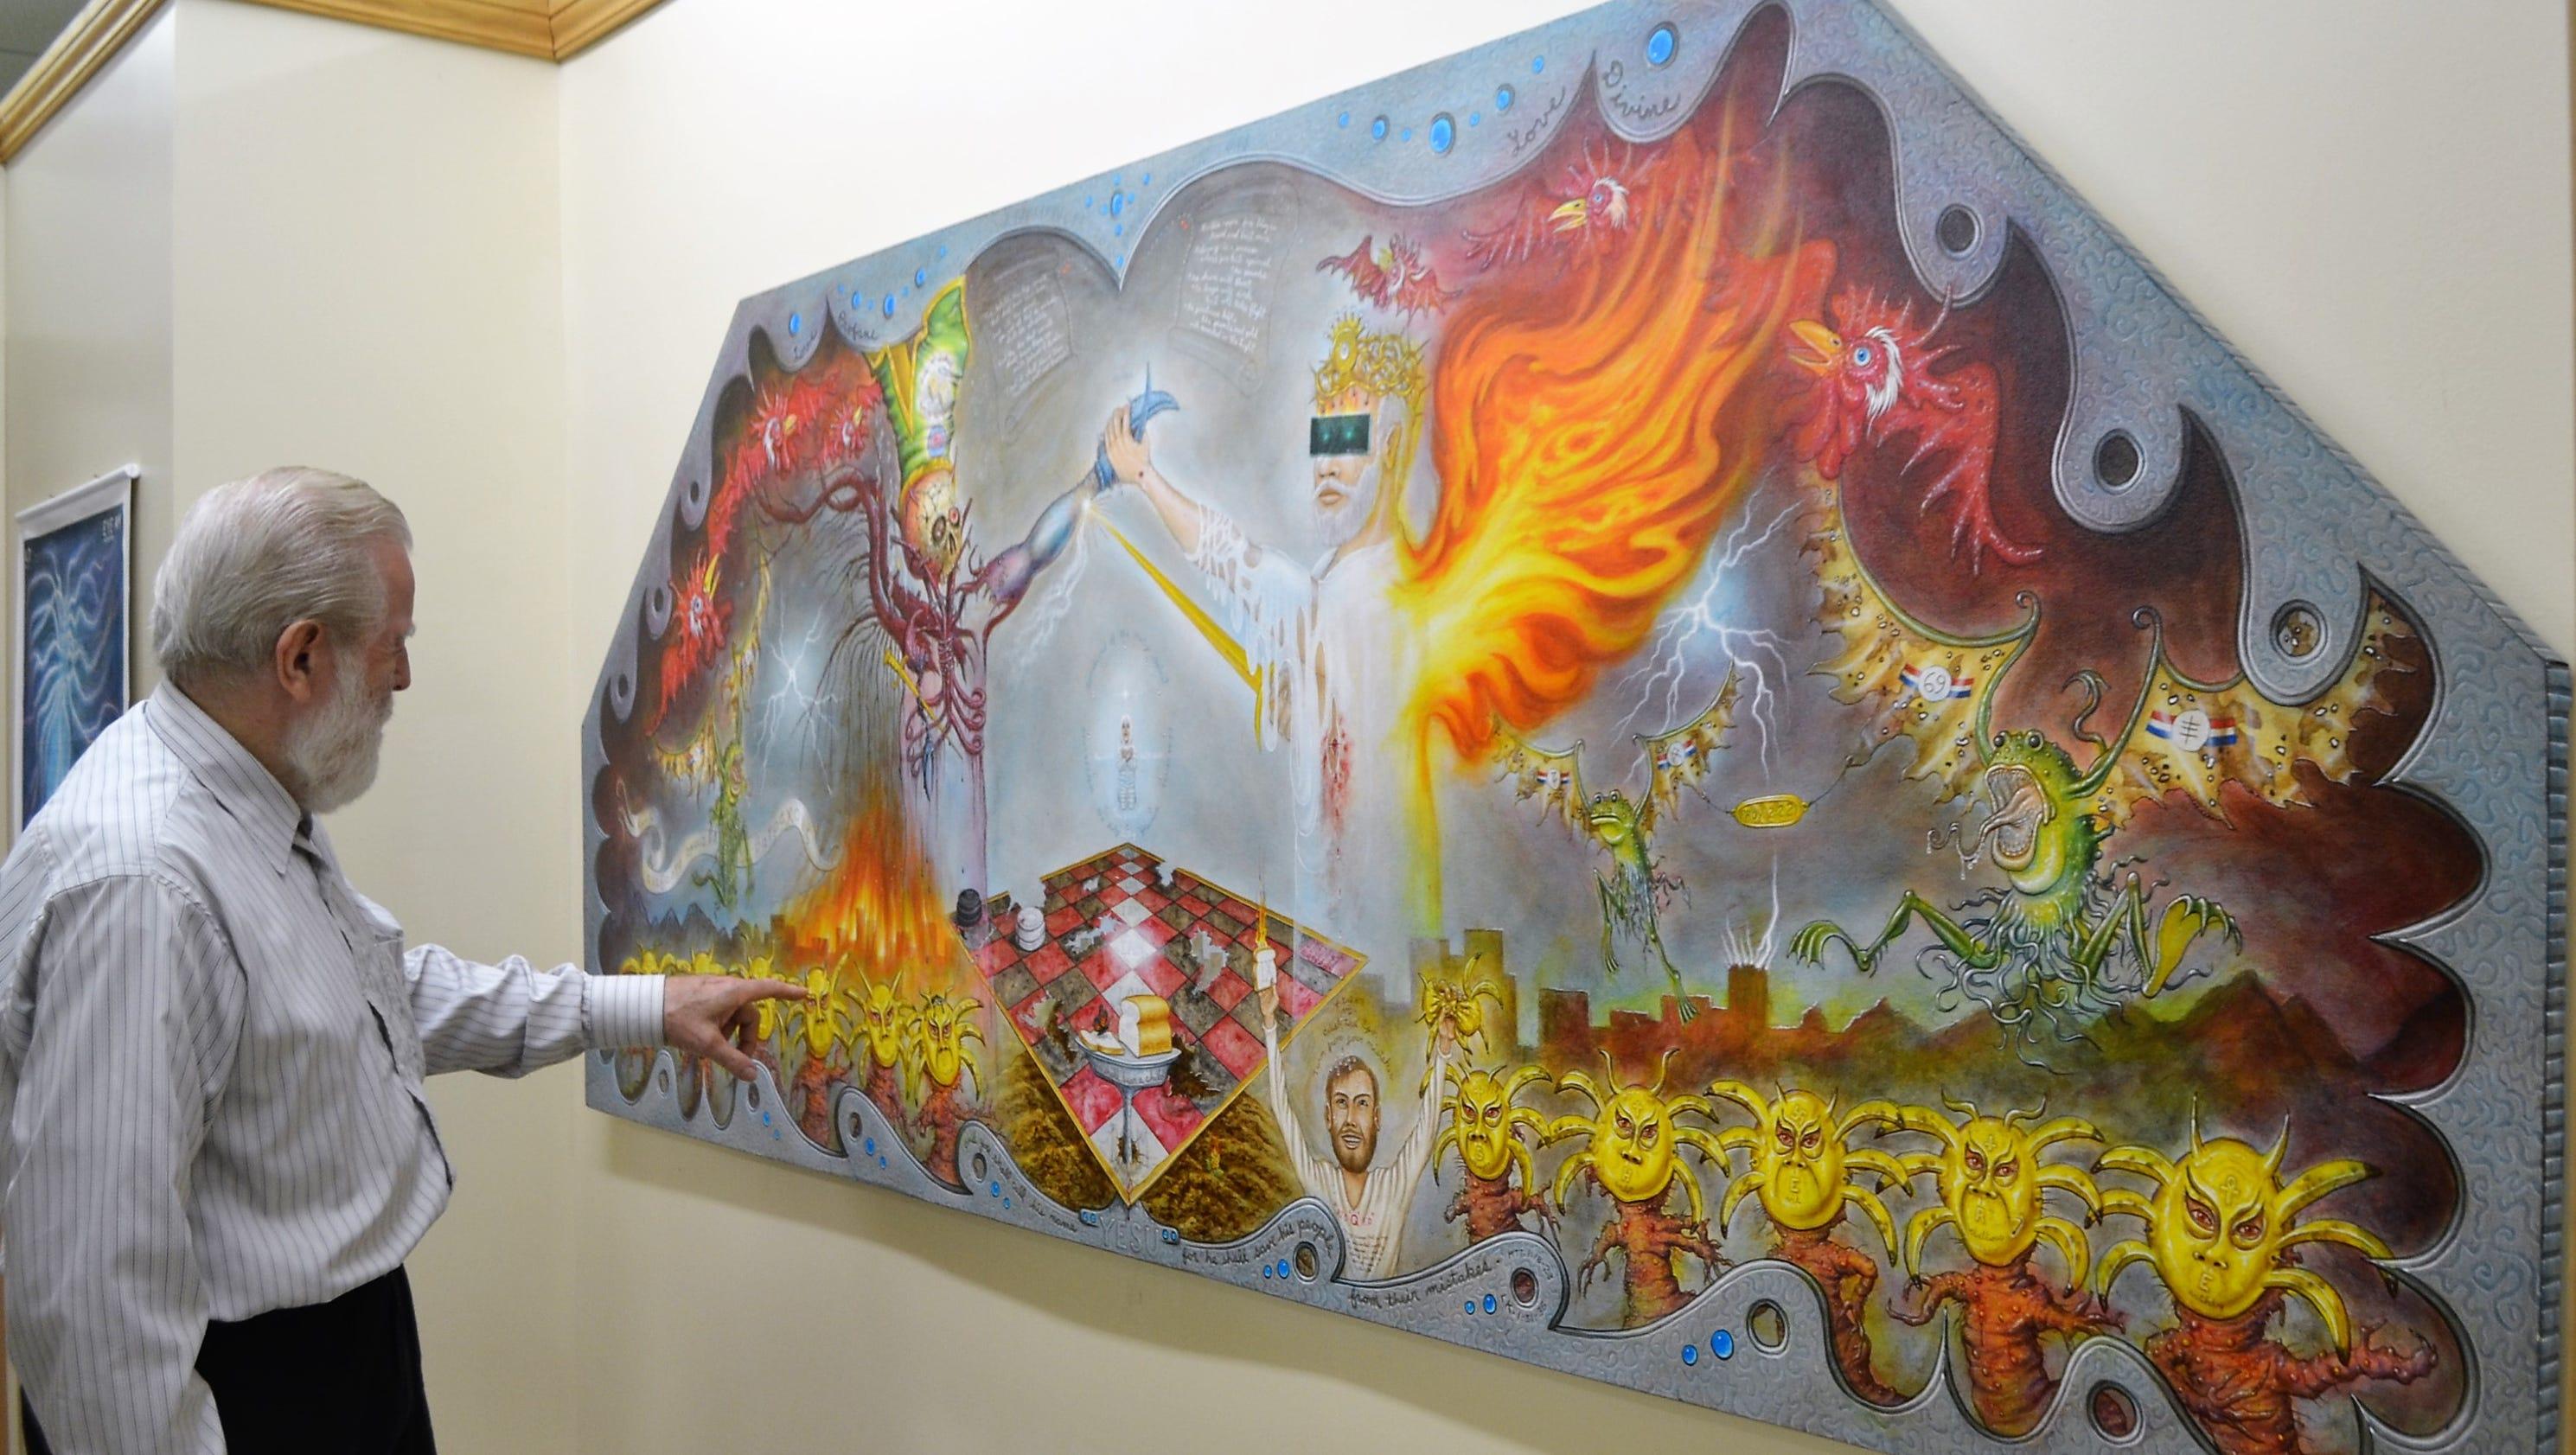 Controversial Artist Norbert Kox To Open Museum Of His